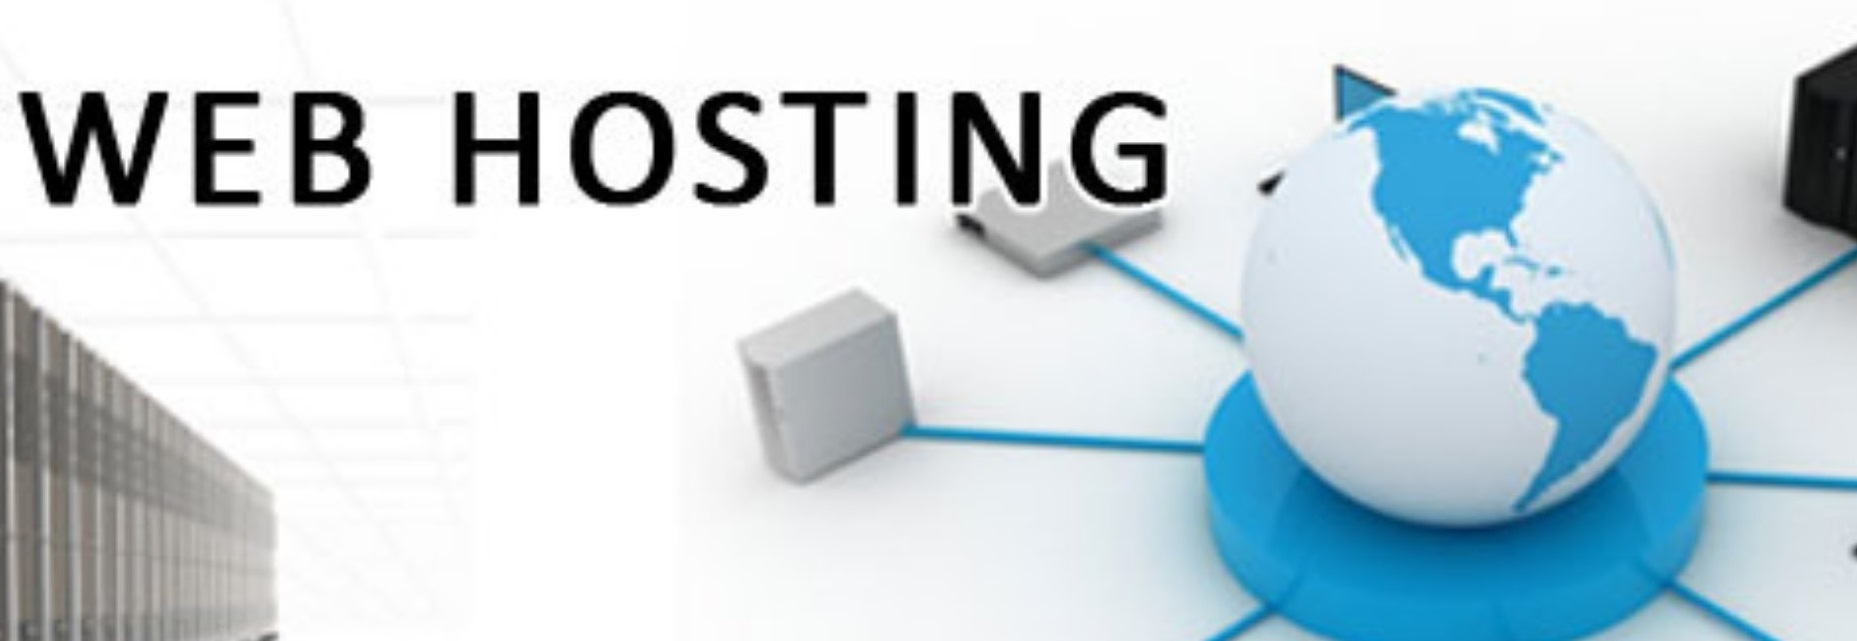 Web Hosting Company | What Does a Web Hosting Company Do?